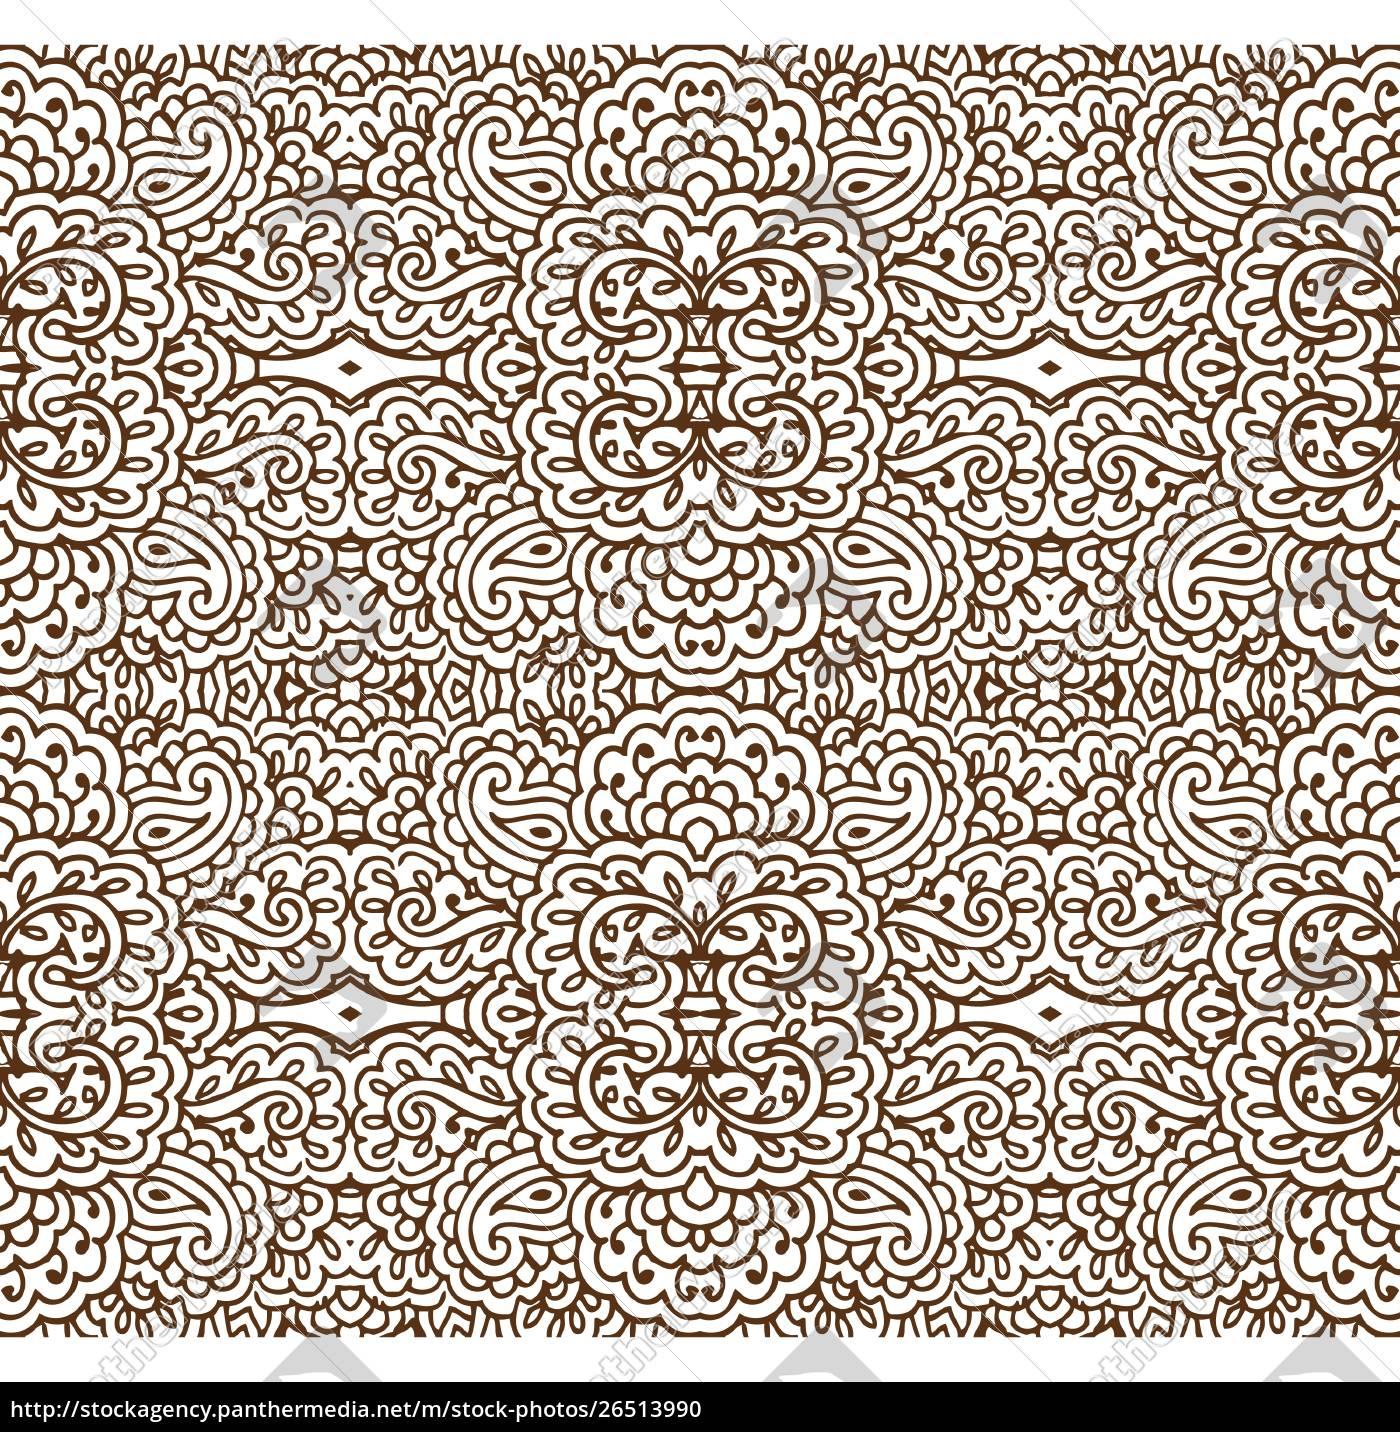 sømløs, sepia, tapet, mønster - 26513990